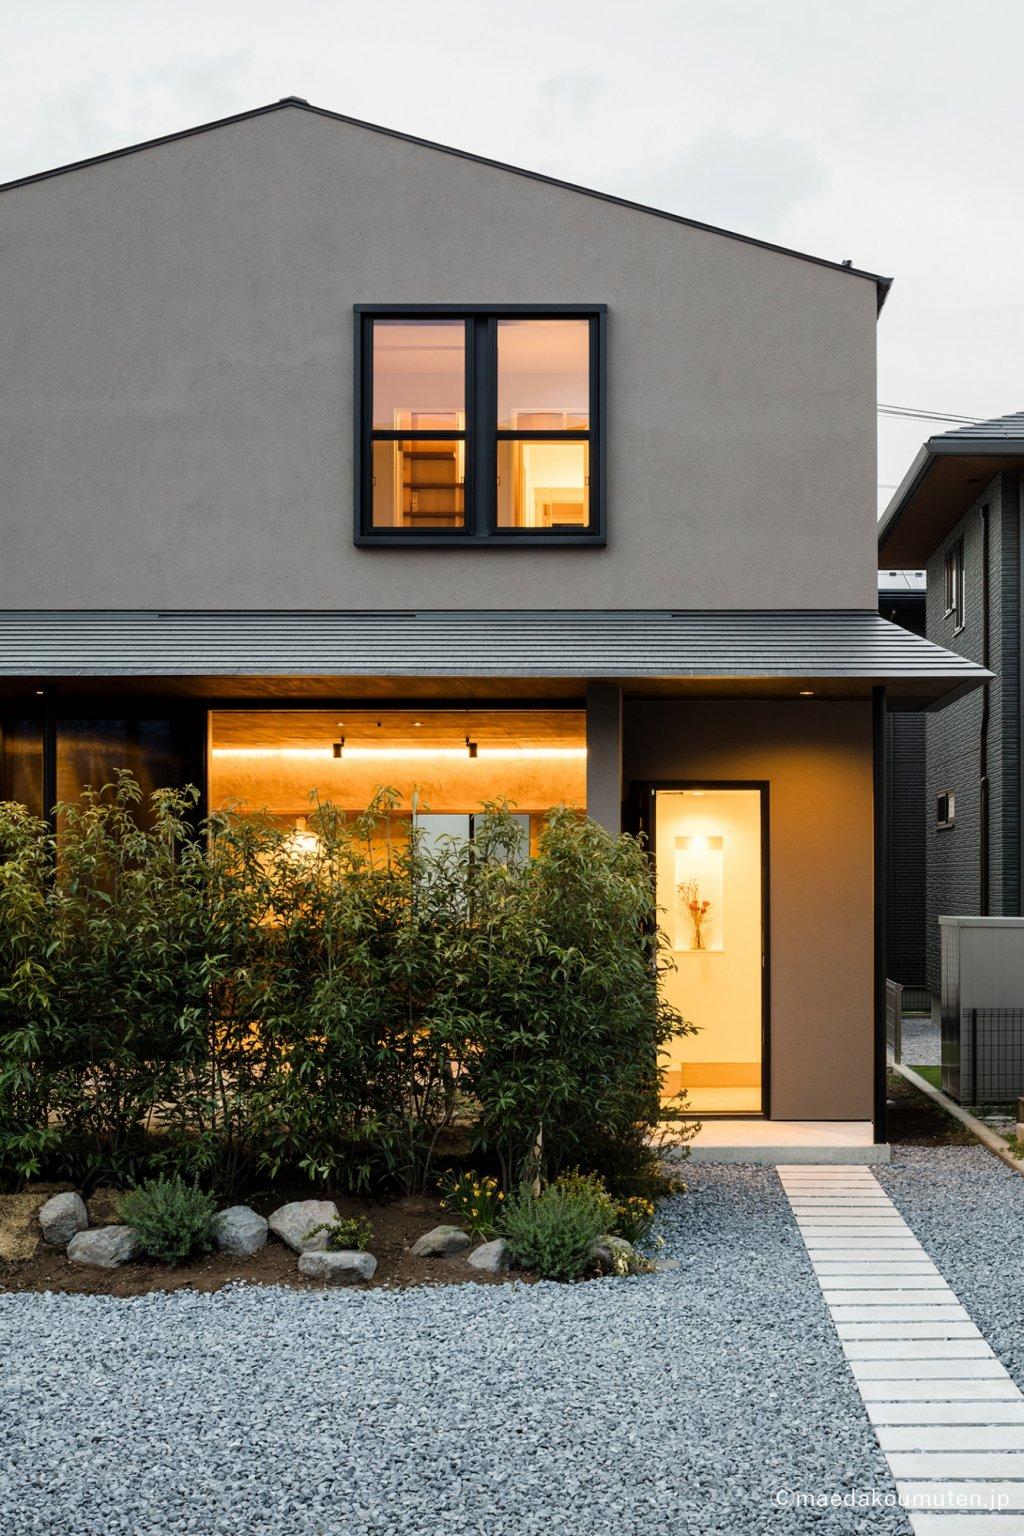 神奈川、工務店、注文住宅、デザイン住宅、建築家、大島の家、32